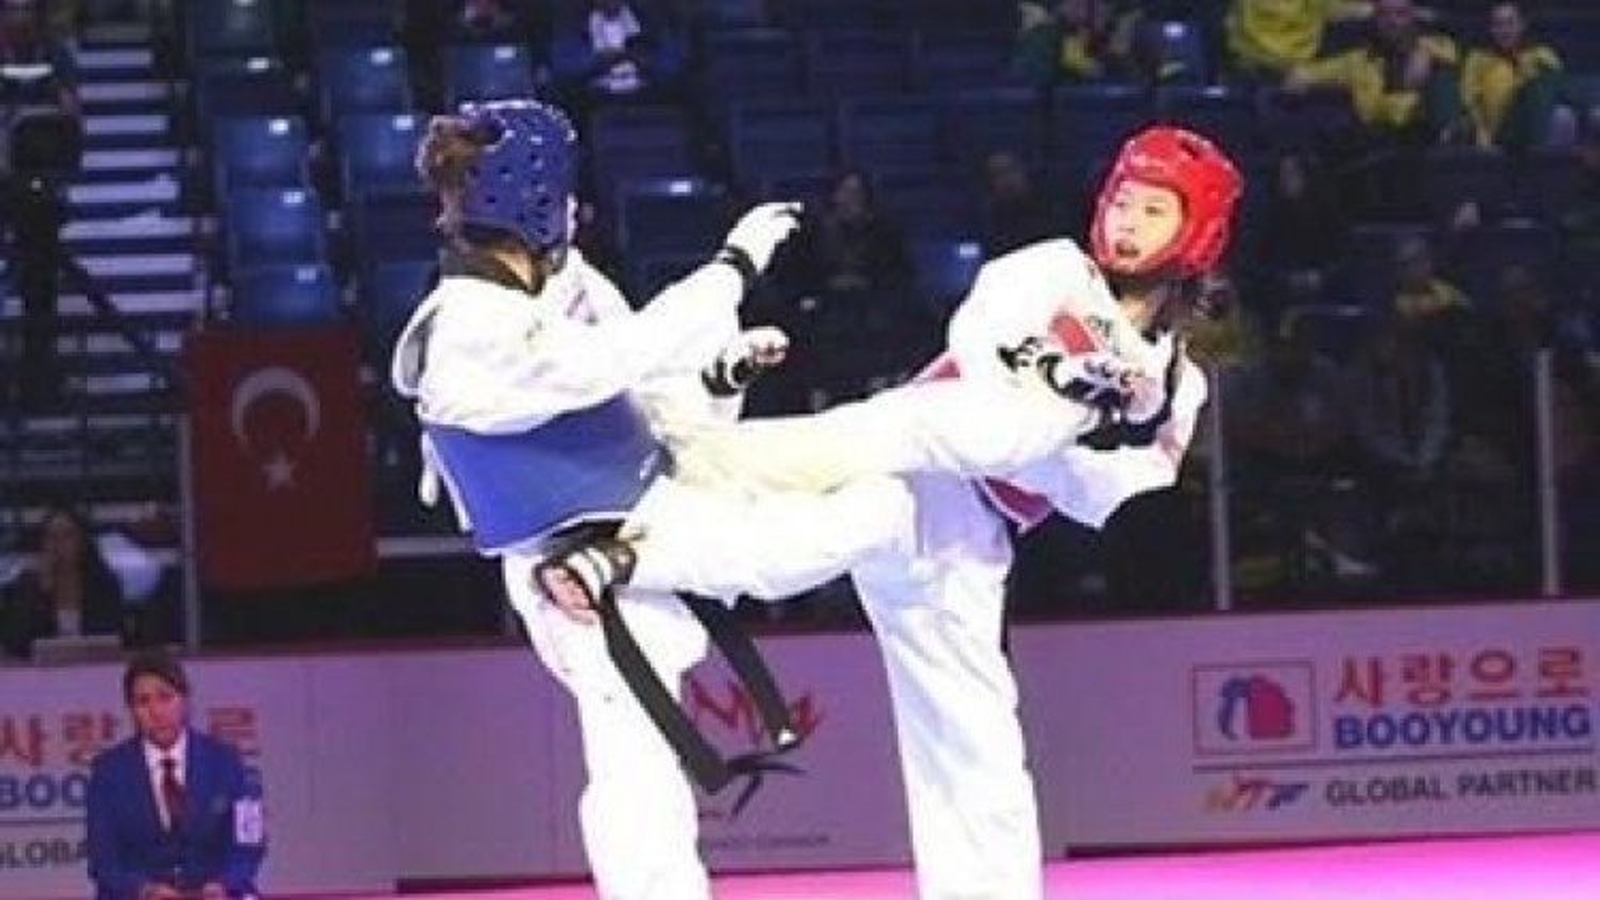 Vietnam taekwondo wins first gold at martial arts mega event in RoK